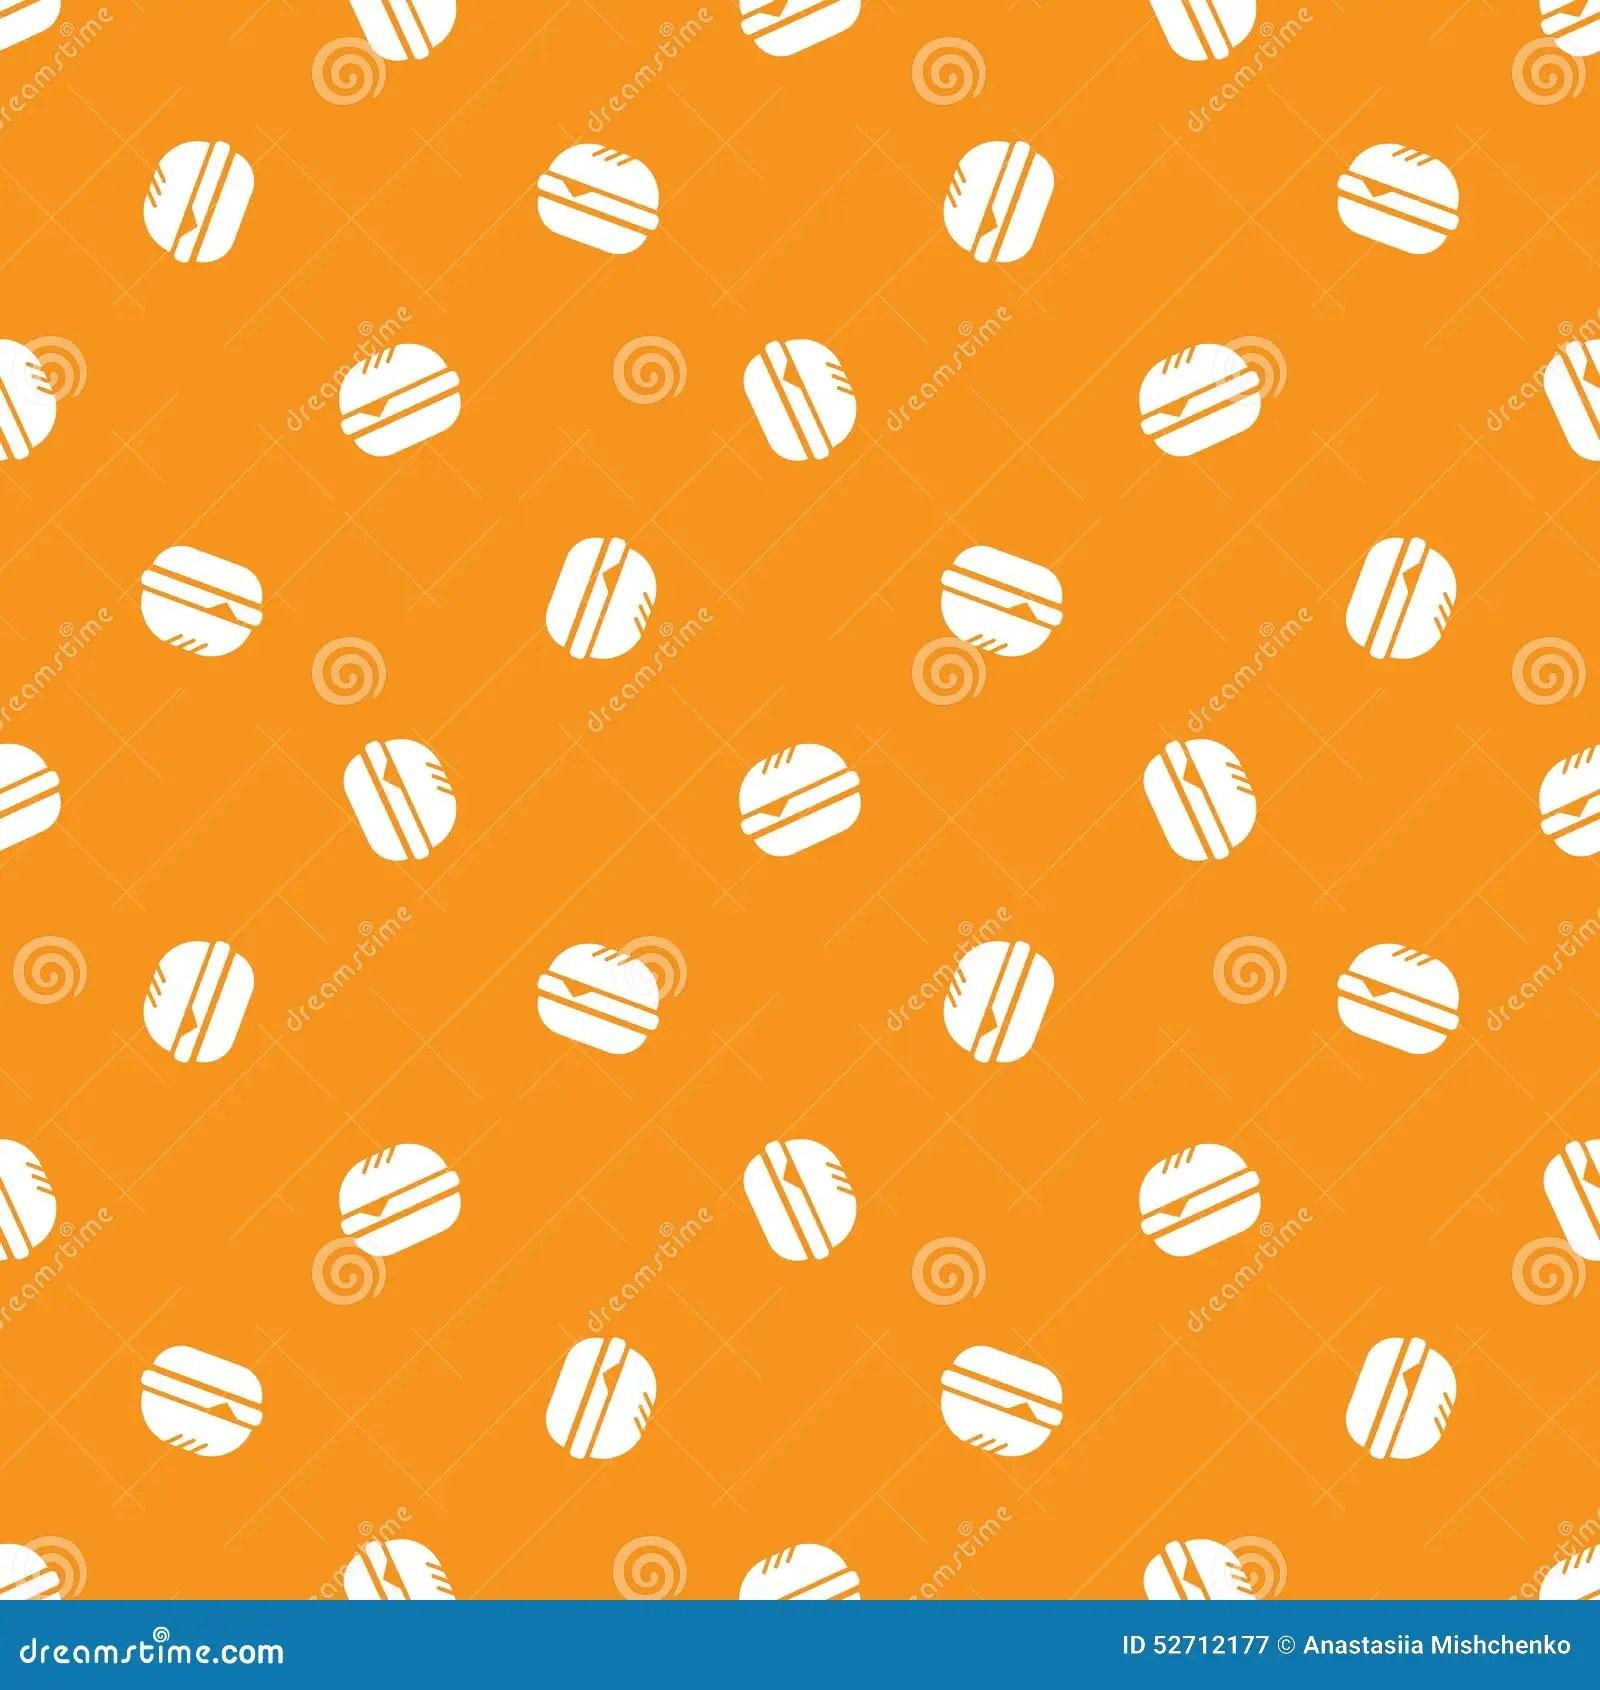 Cute Minimalistic Wallpapers Vector Minimalistic Burger Seamless Pattern Stock Vector